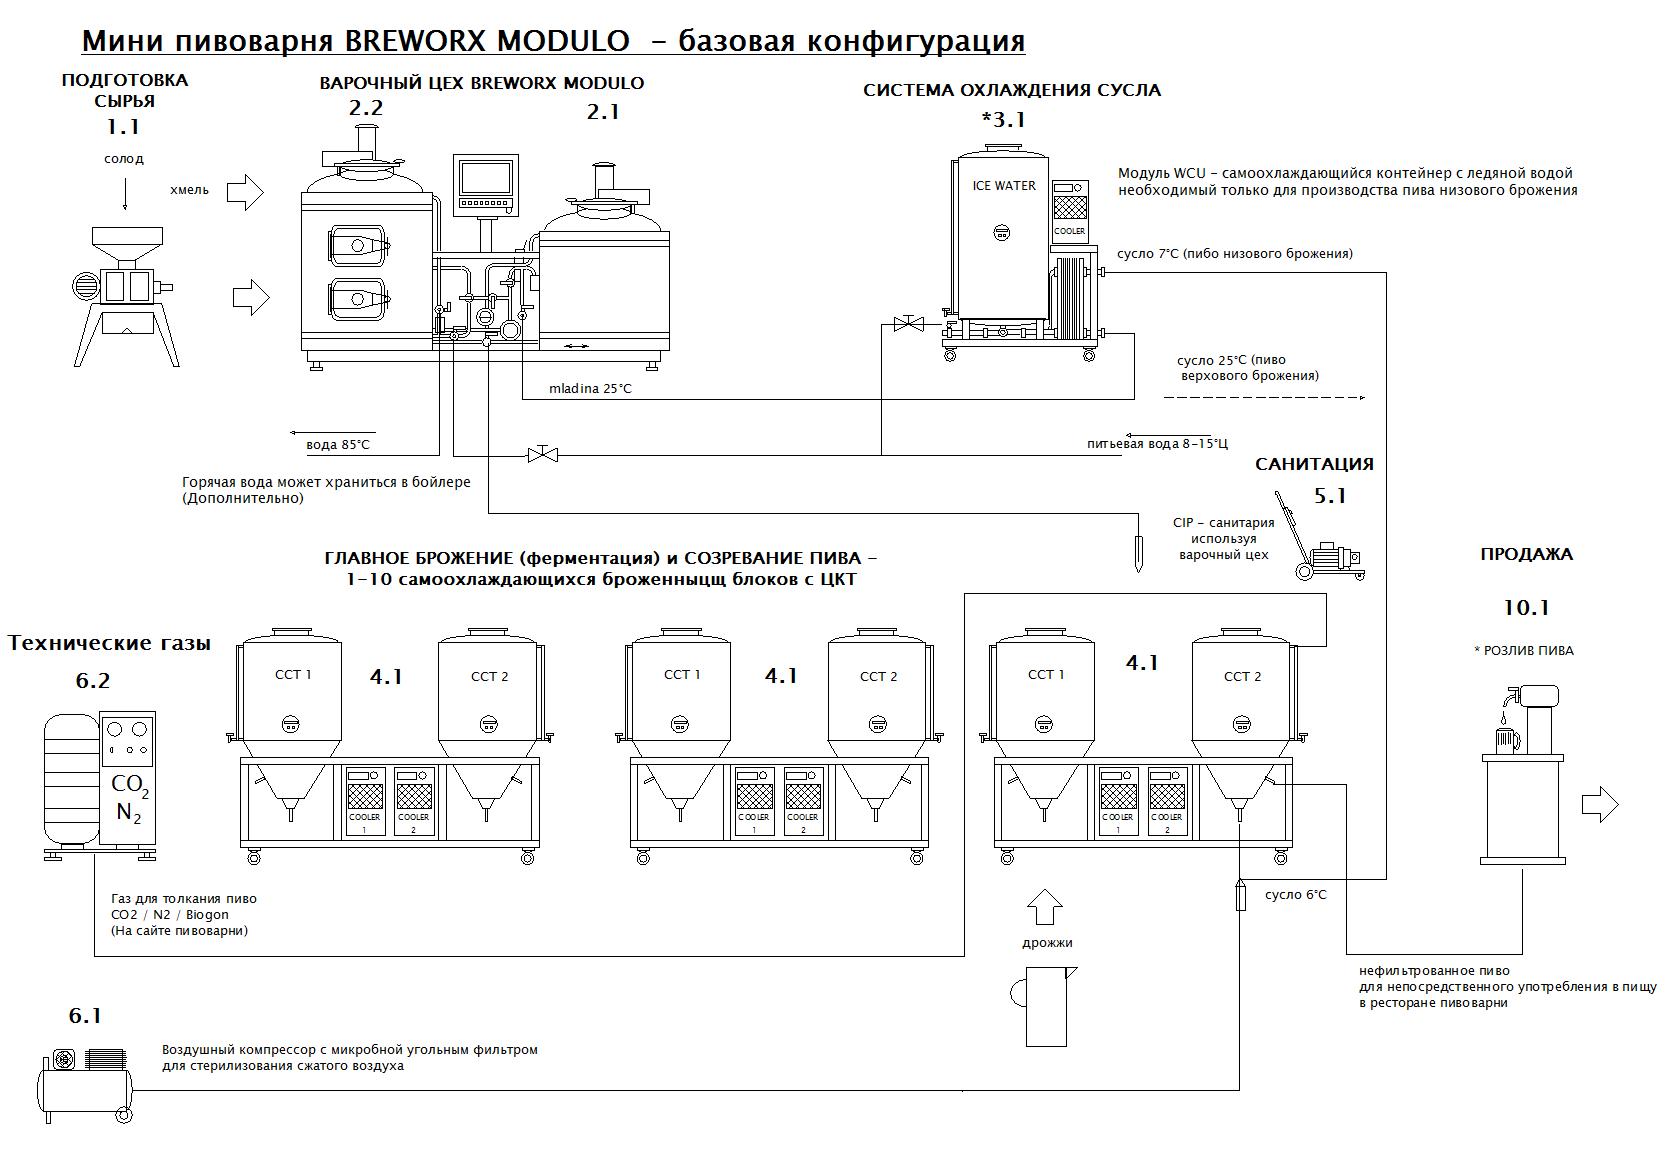 blokove-schema-mp-bwx-modulo-zaklad-001-rus